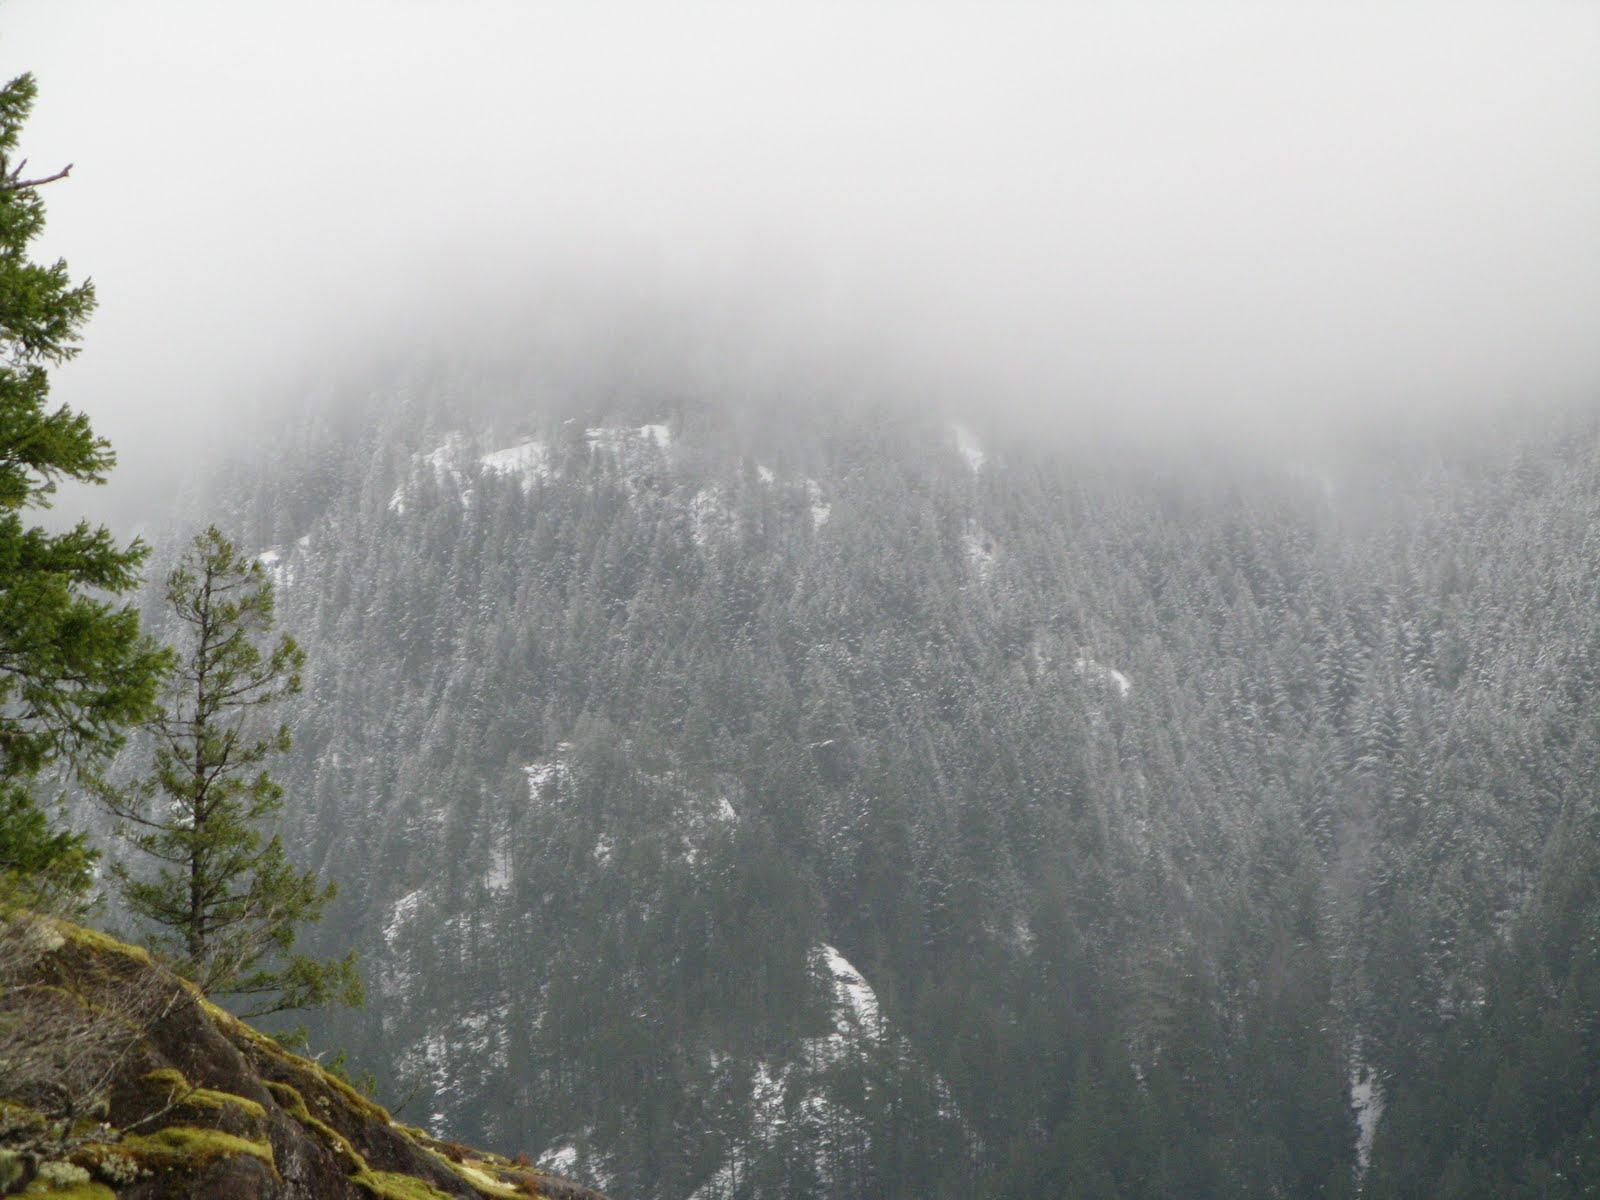 Powell River Books Blog: Snow Above, Rain Below